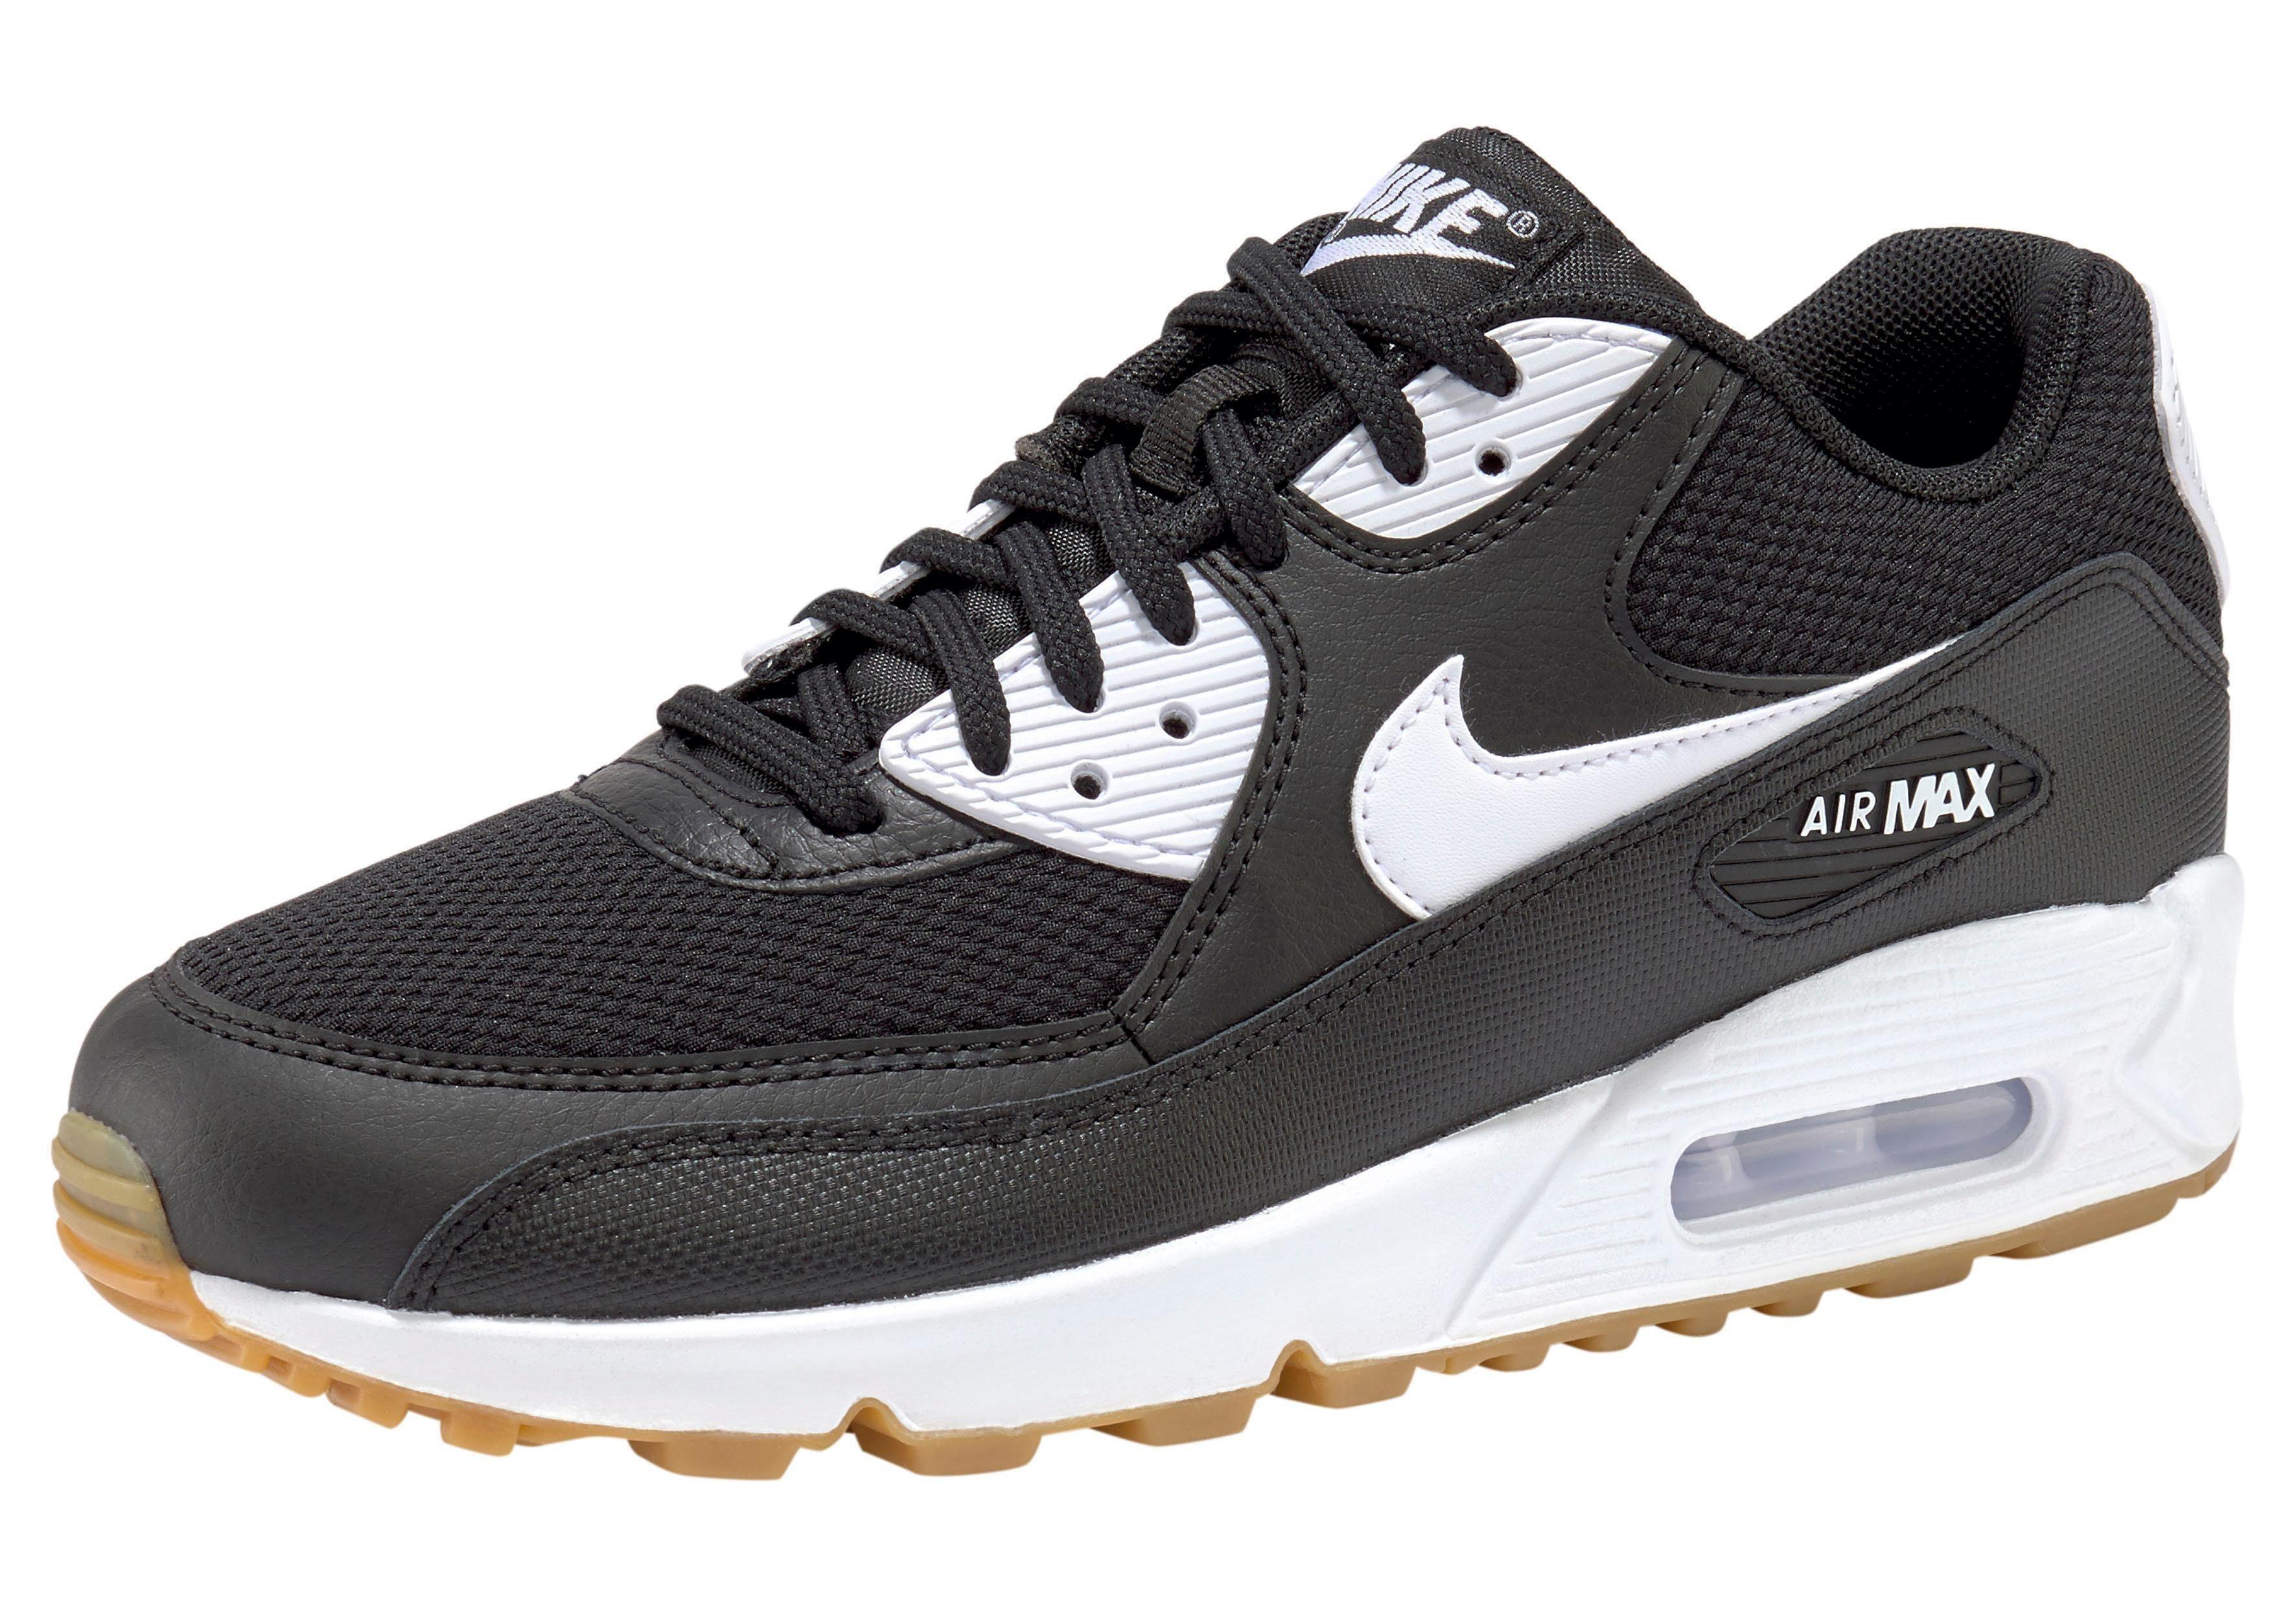 Nike Sportswear »WMNS AIR MAX 90« Sneaker kaufen | OTTO